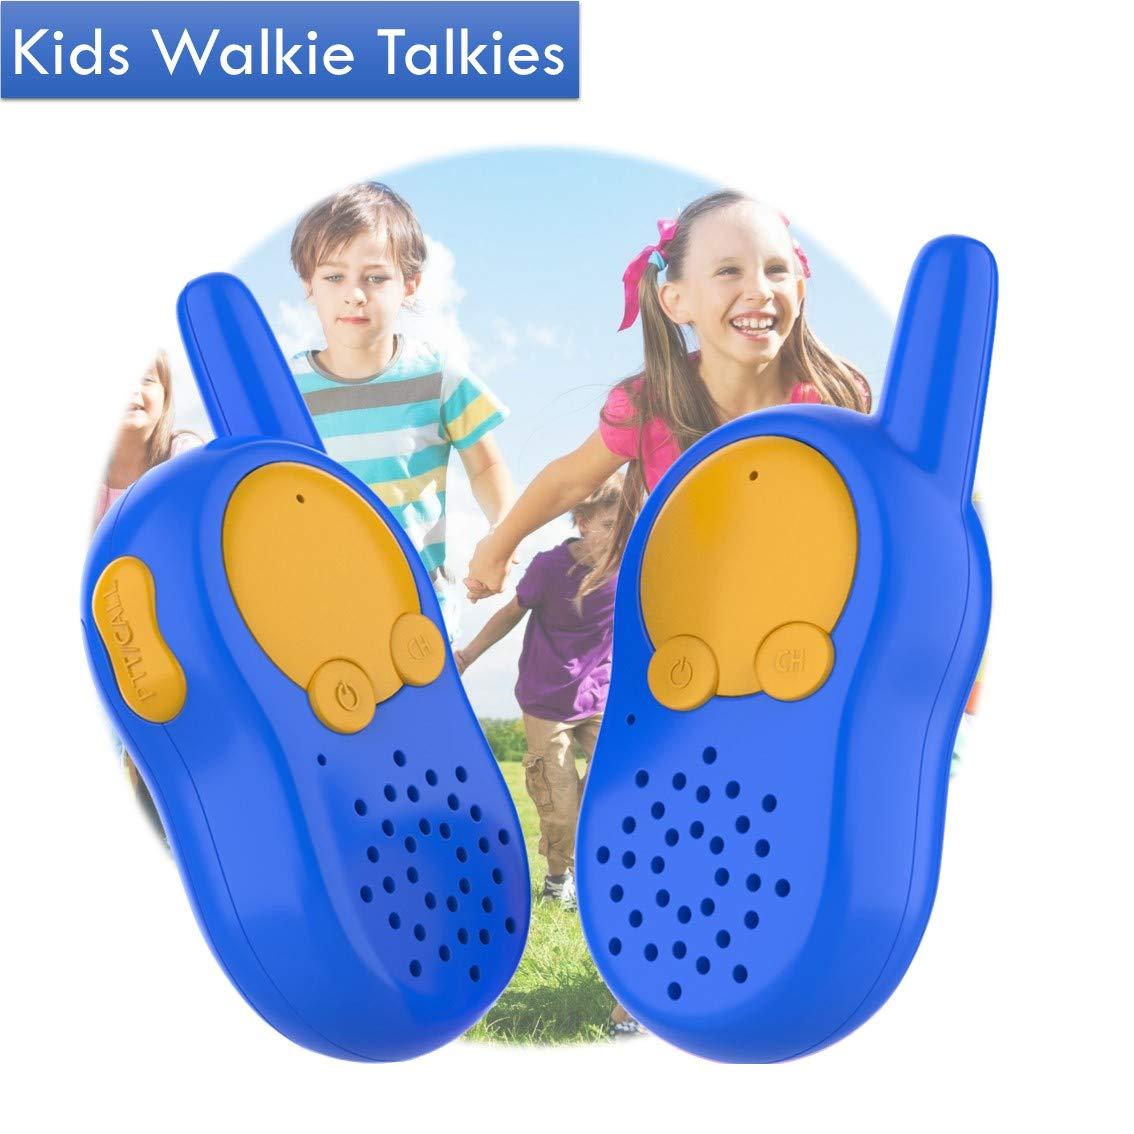 Walkie Talkie Kinder ab 3, Woki Toki, Waki Takis, Walky Talky kinder ...